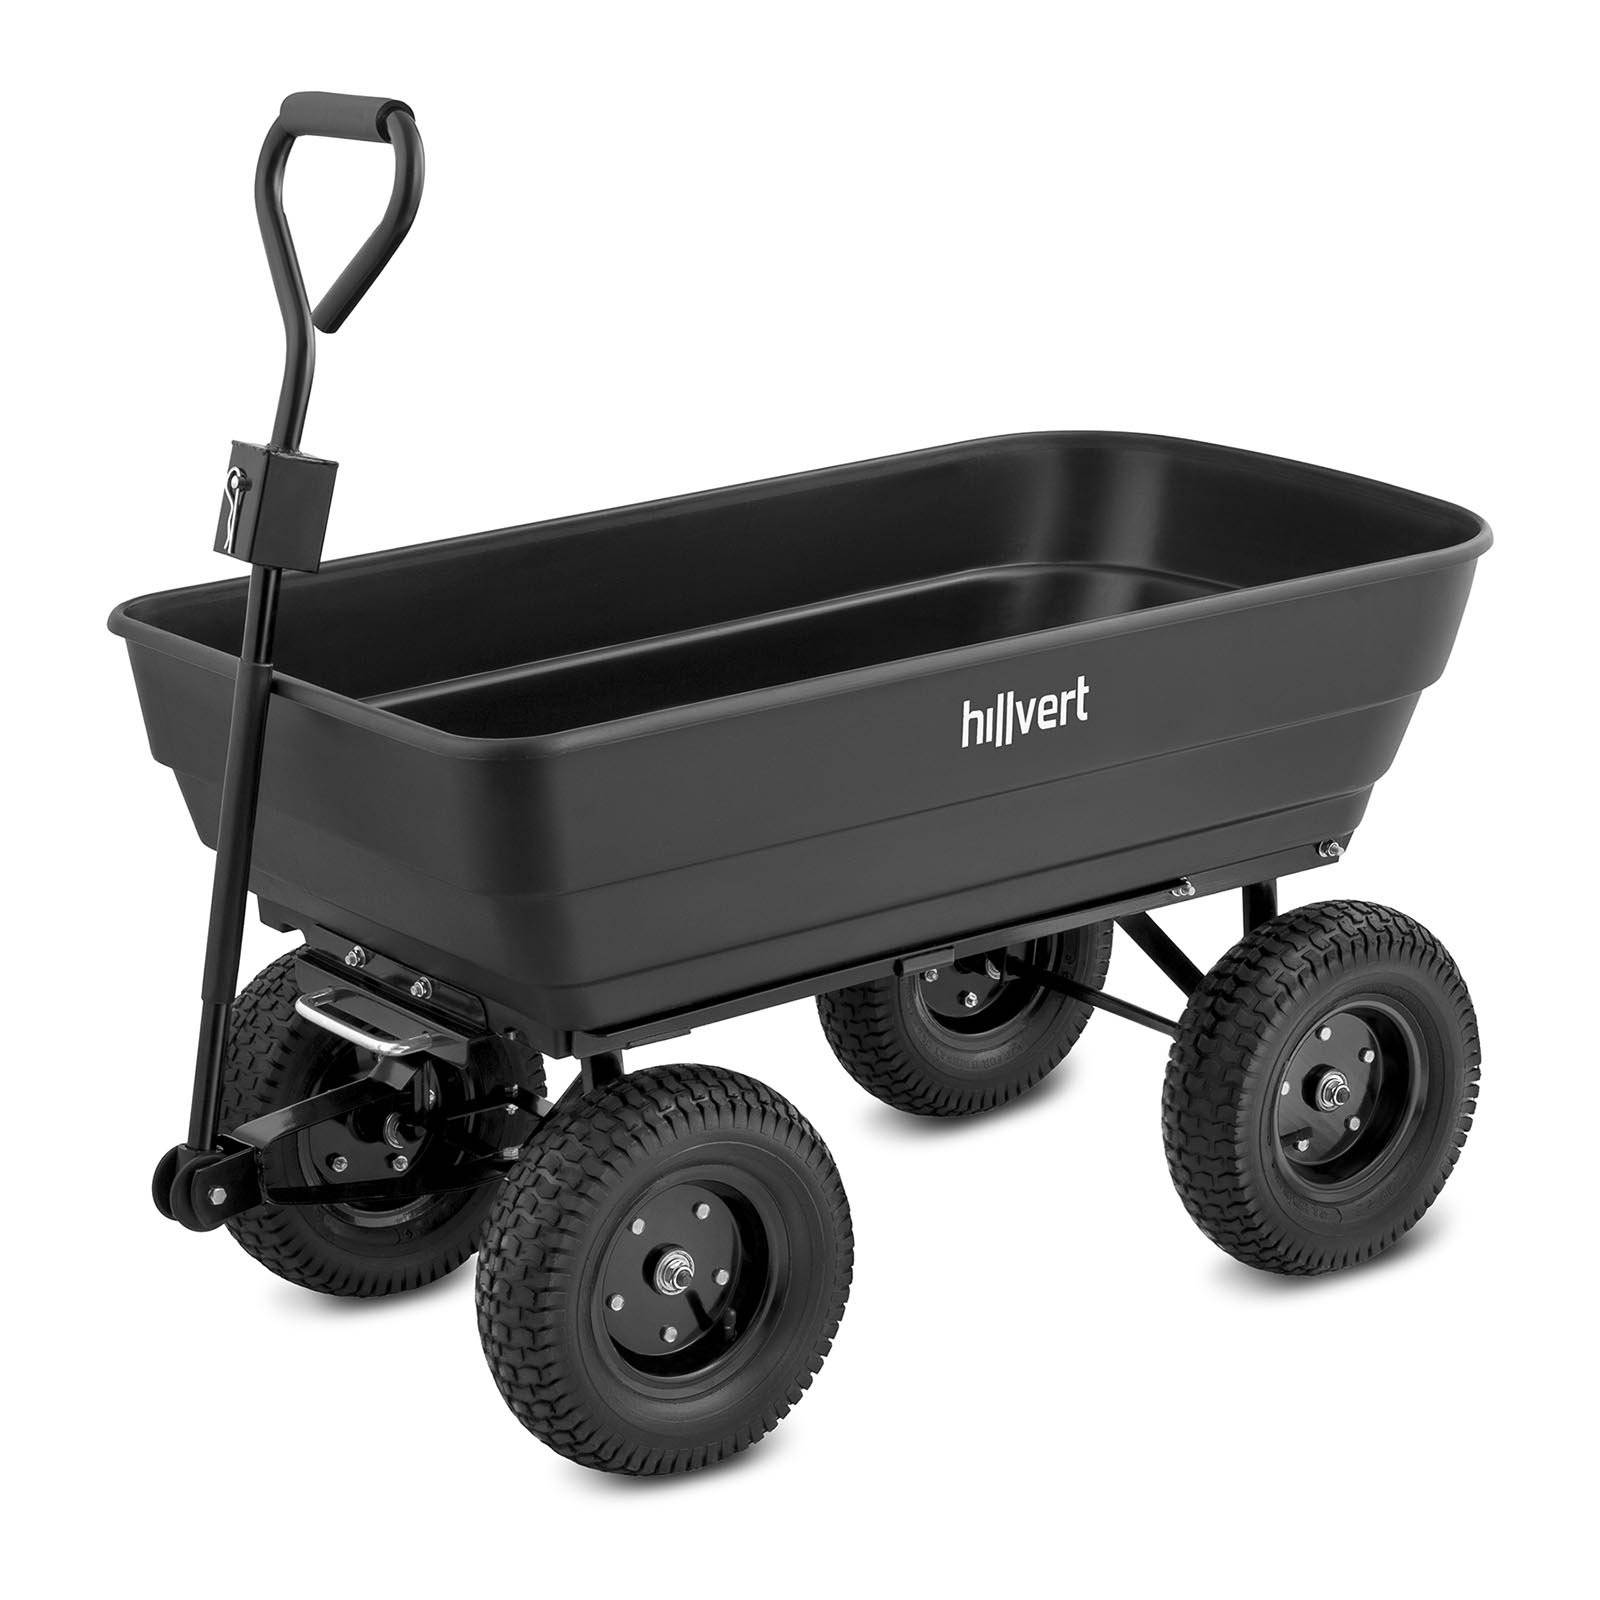 hillvert Carretto da giardino - 350 kg - ribaltabile - 125 L HT-Q.BASS-125G